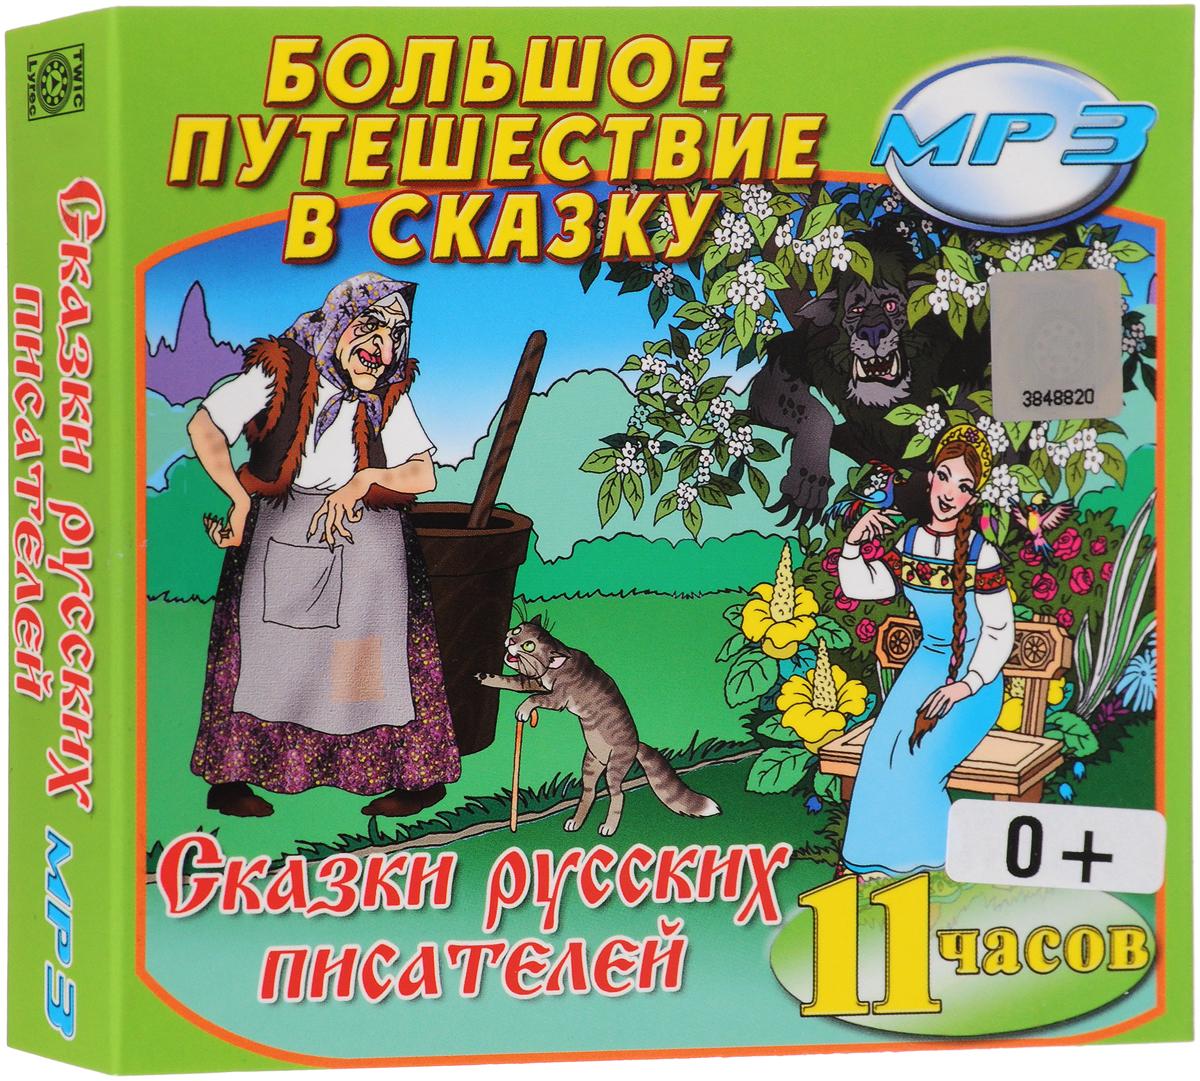 Сказки русских писателей (аудиокнига MP3 на 2 CD)